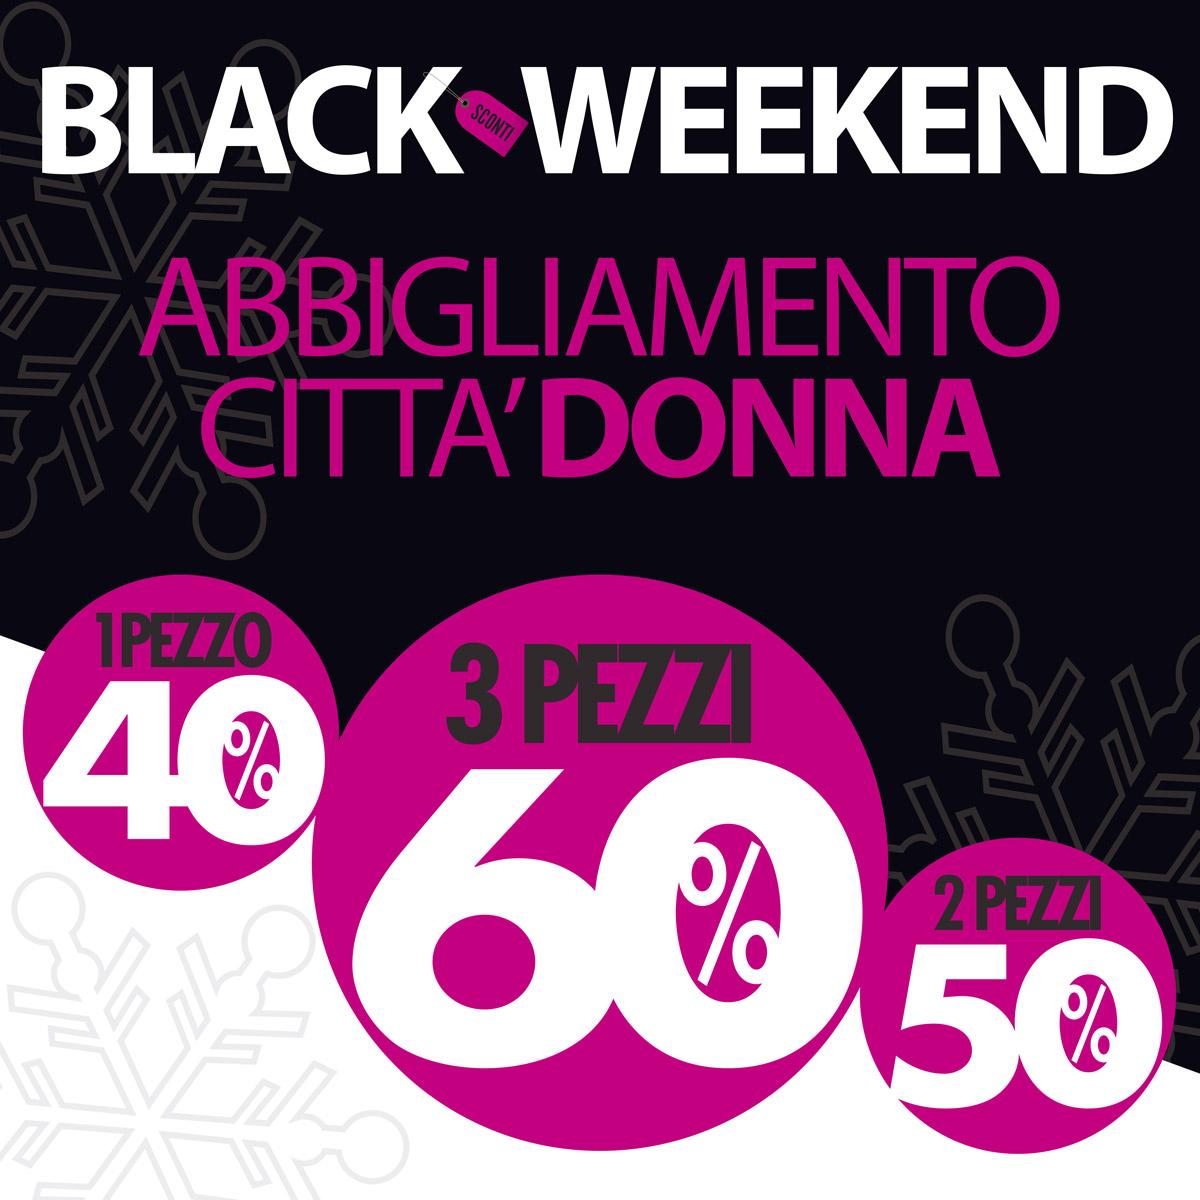 Promo-VERNANTE-ABBIGL-DONNA_Sconto1pz40-2pz50-3pz50_BannerNewsletter